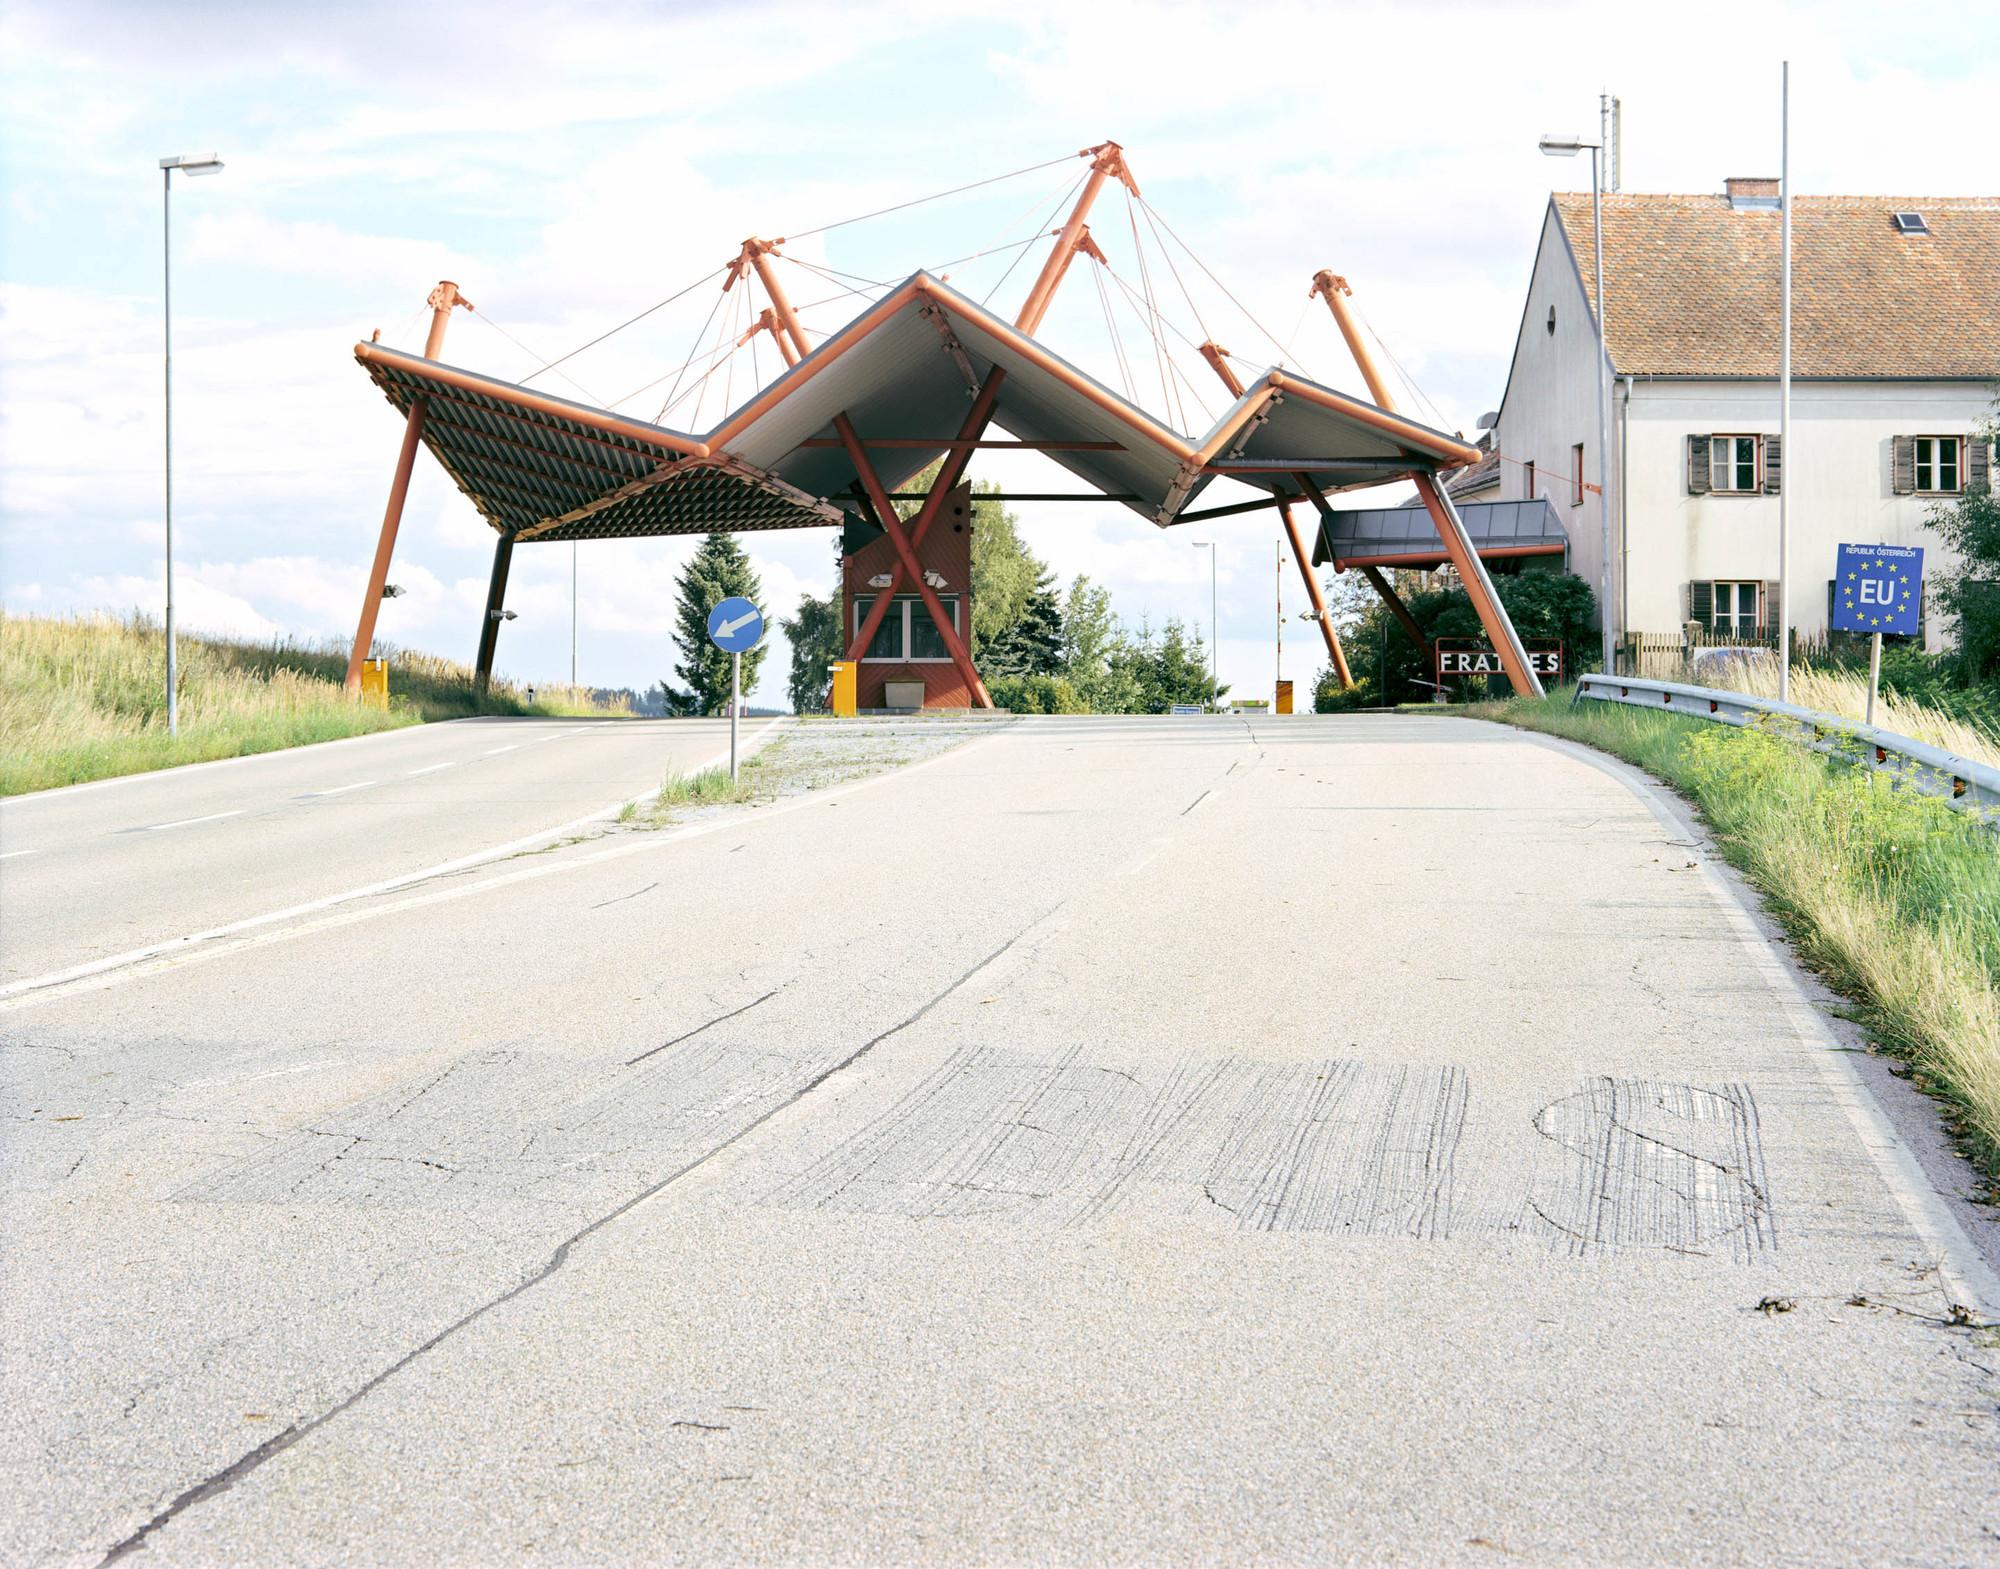 Built Reminders of a Former Time: Europe's Dissolved Border Crossings Photographed, Border: Austria / Czech Republic. Image © Ignacio Evangelista